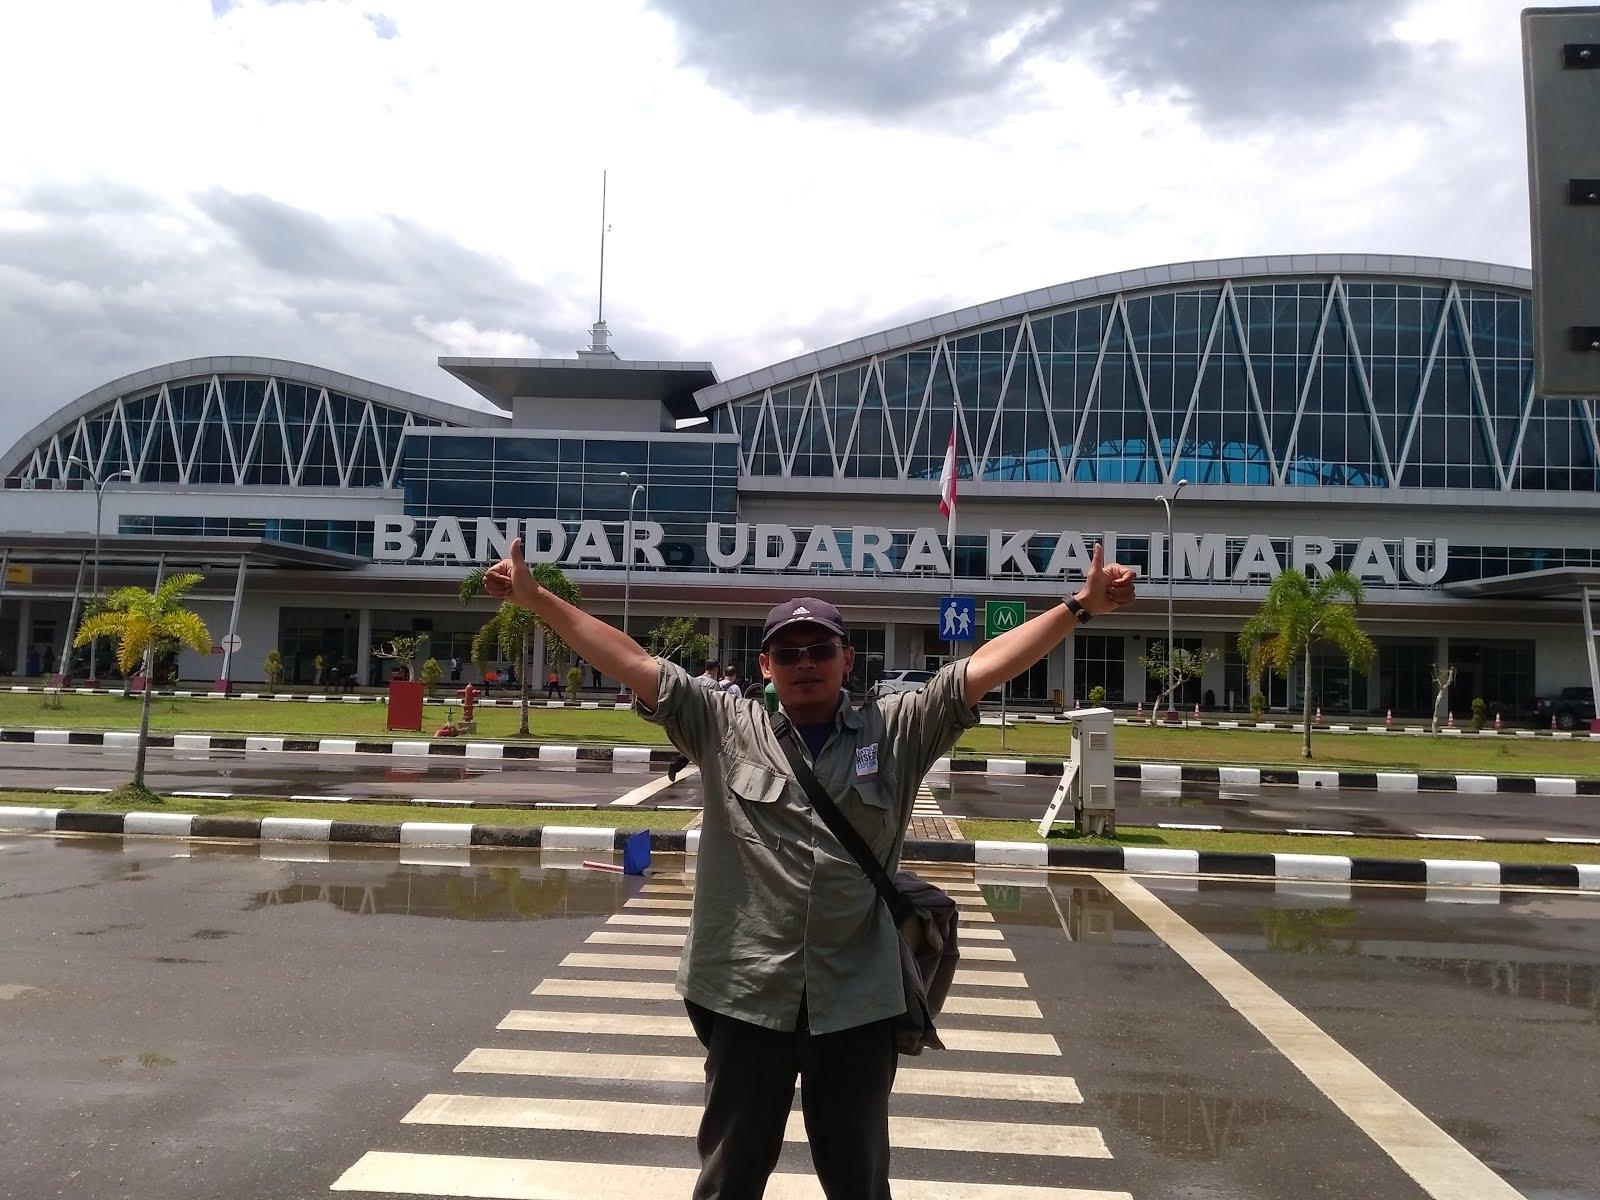 Kalimarau Airport